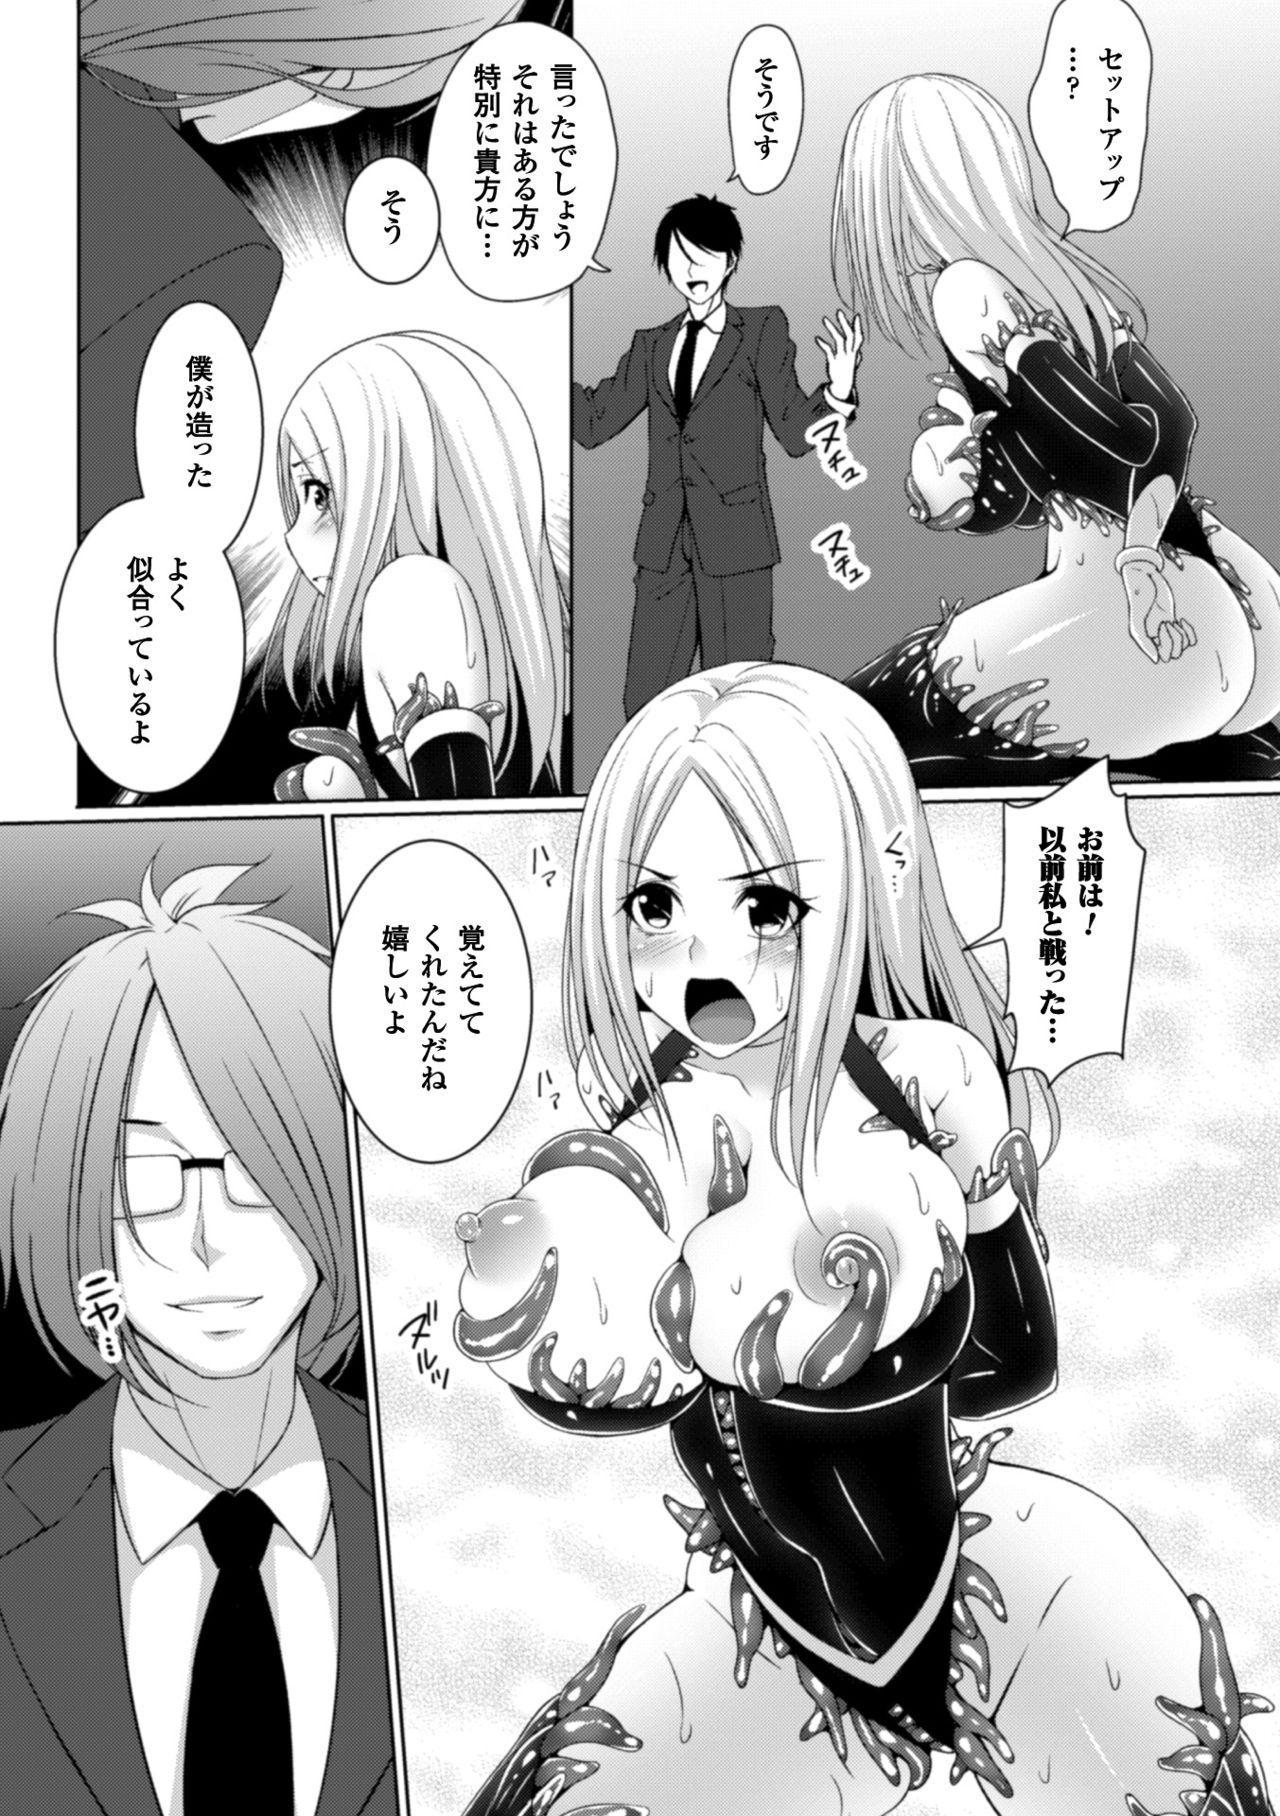 2D Comic Magazine Shokushu Yoroi ni Zenshin o Okasare Mugen Zecchou! Vol. 5 68